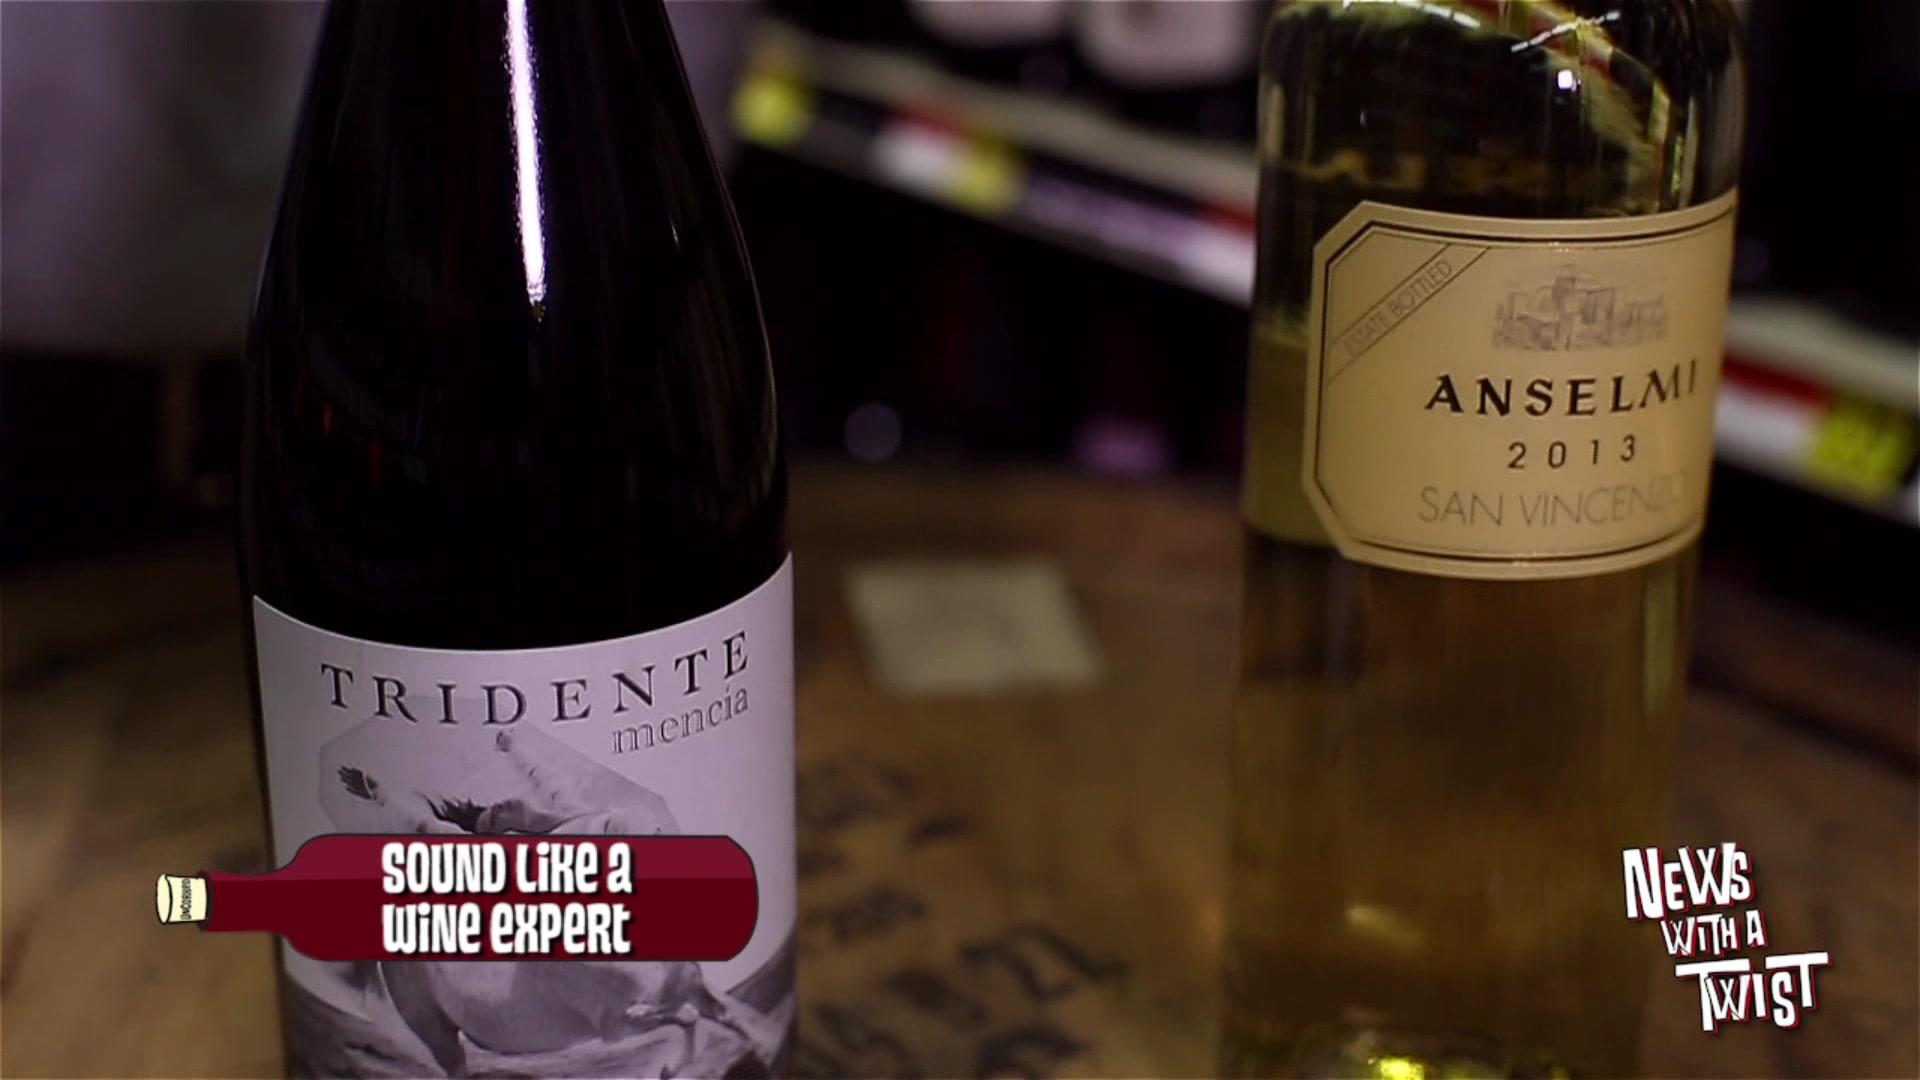 How to Sound Like a Wine Expert